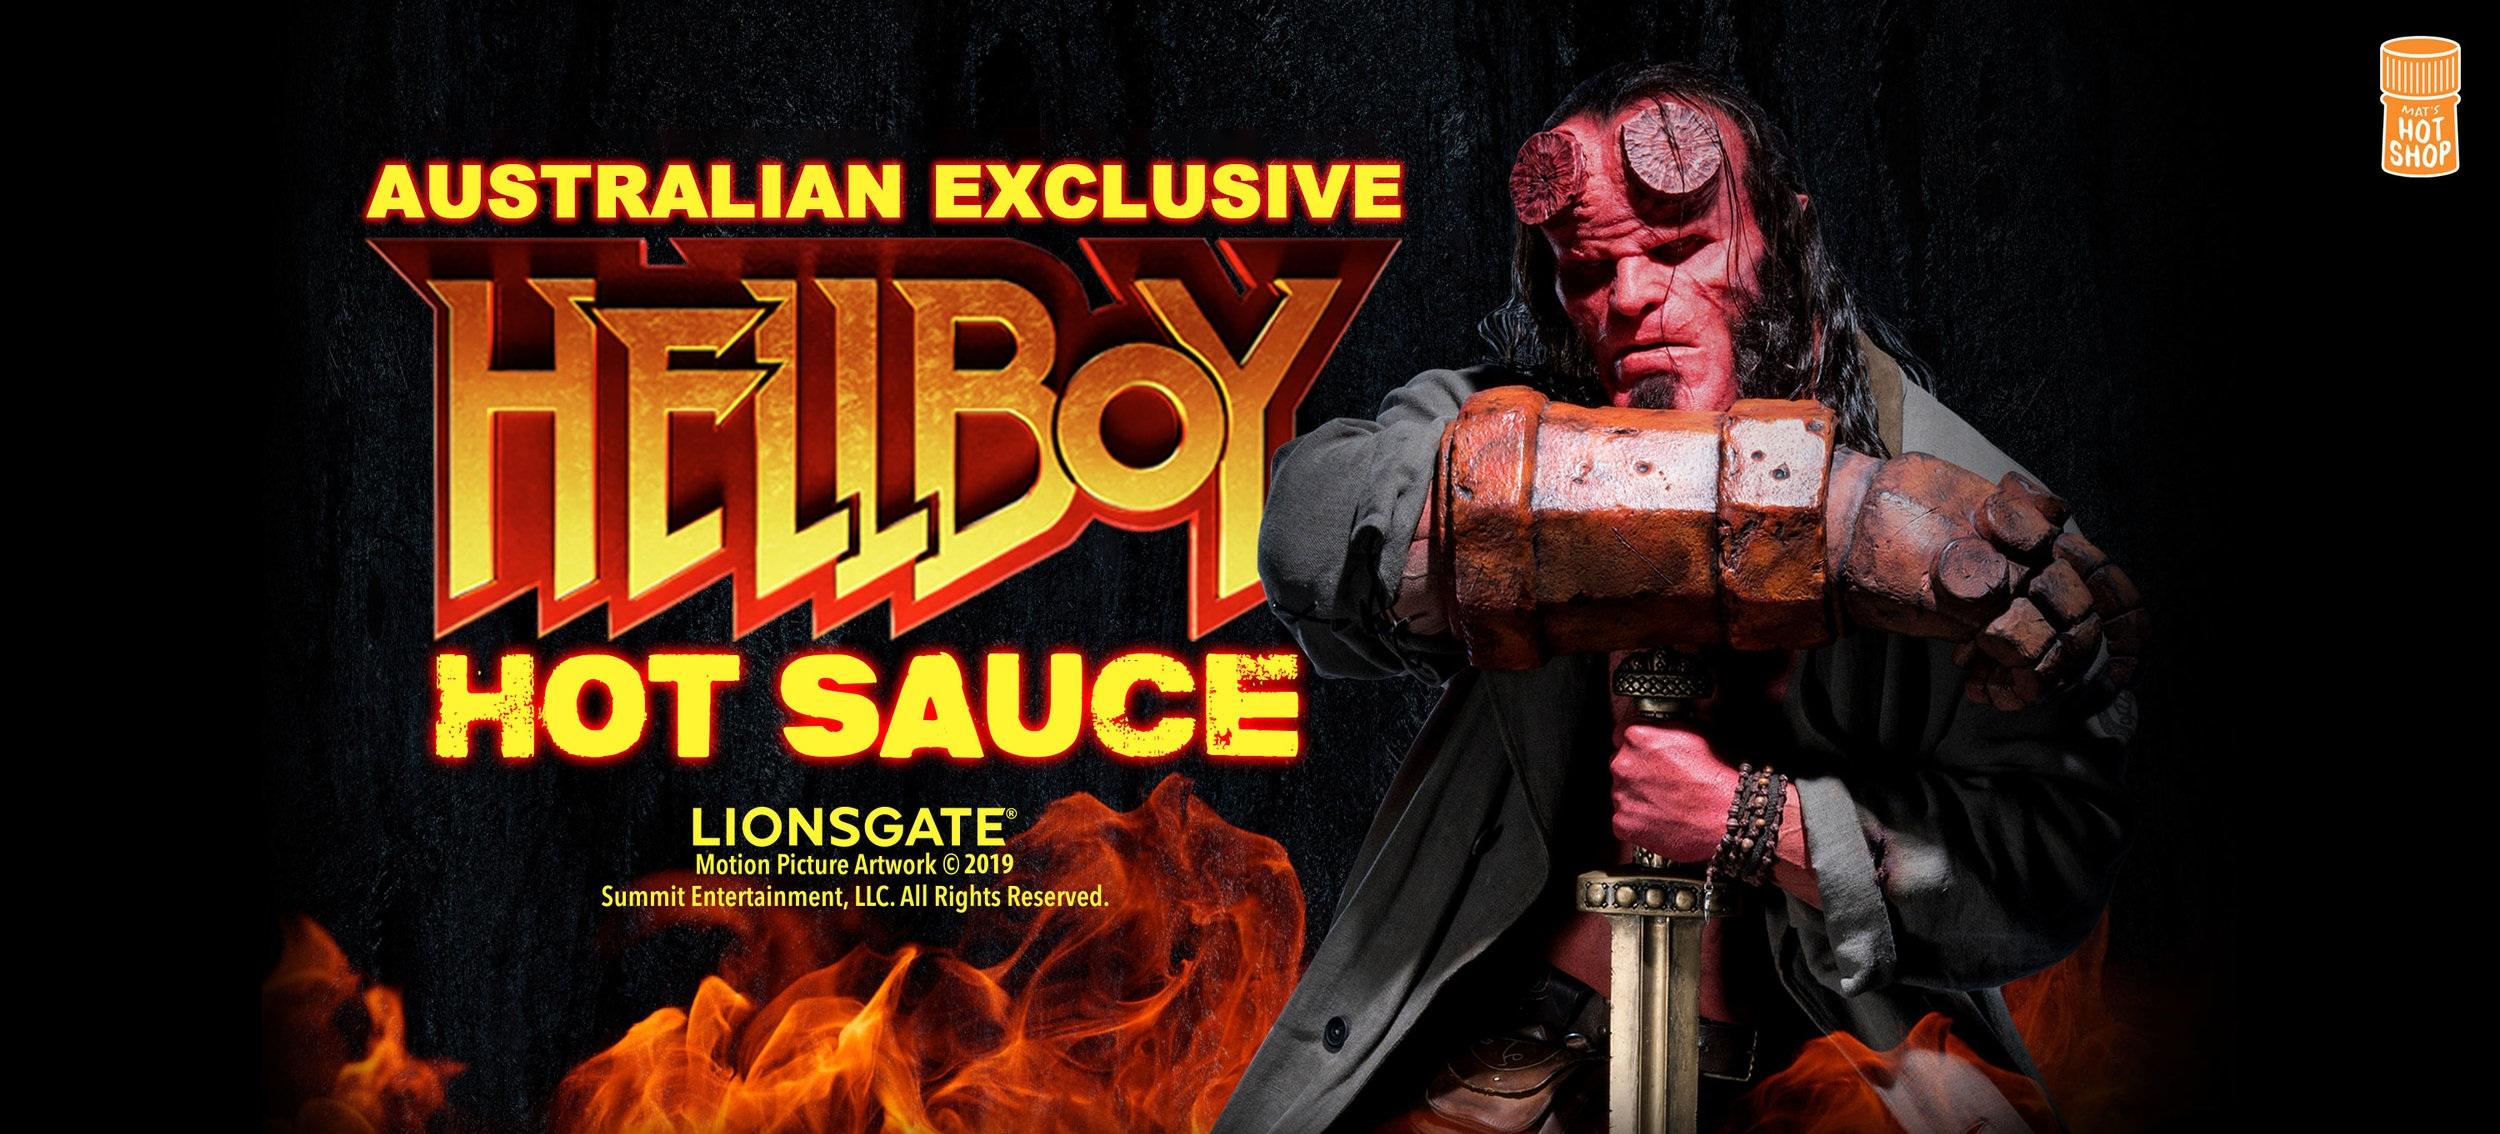 Hellboy+Movie+2019+Hot+Sauce